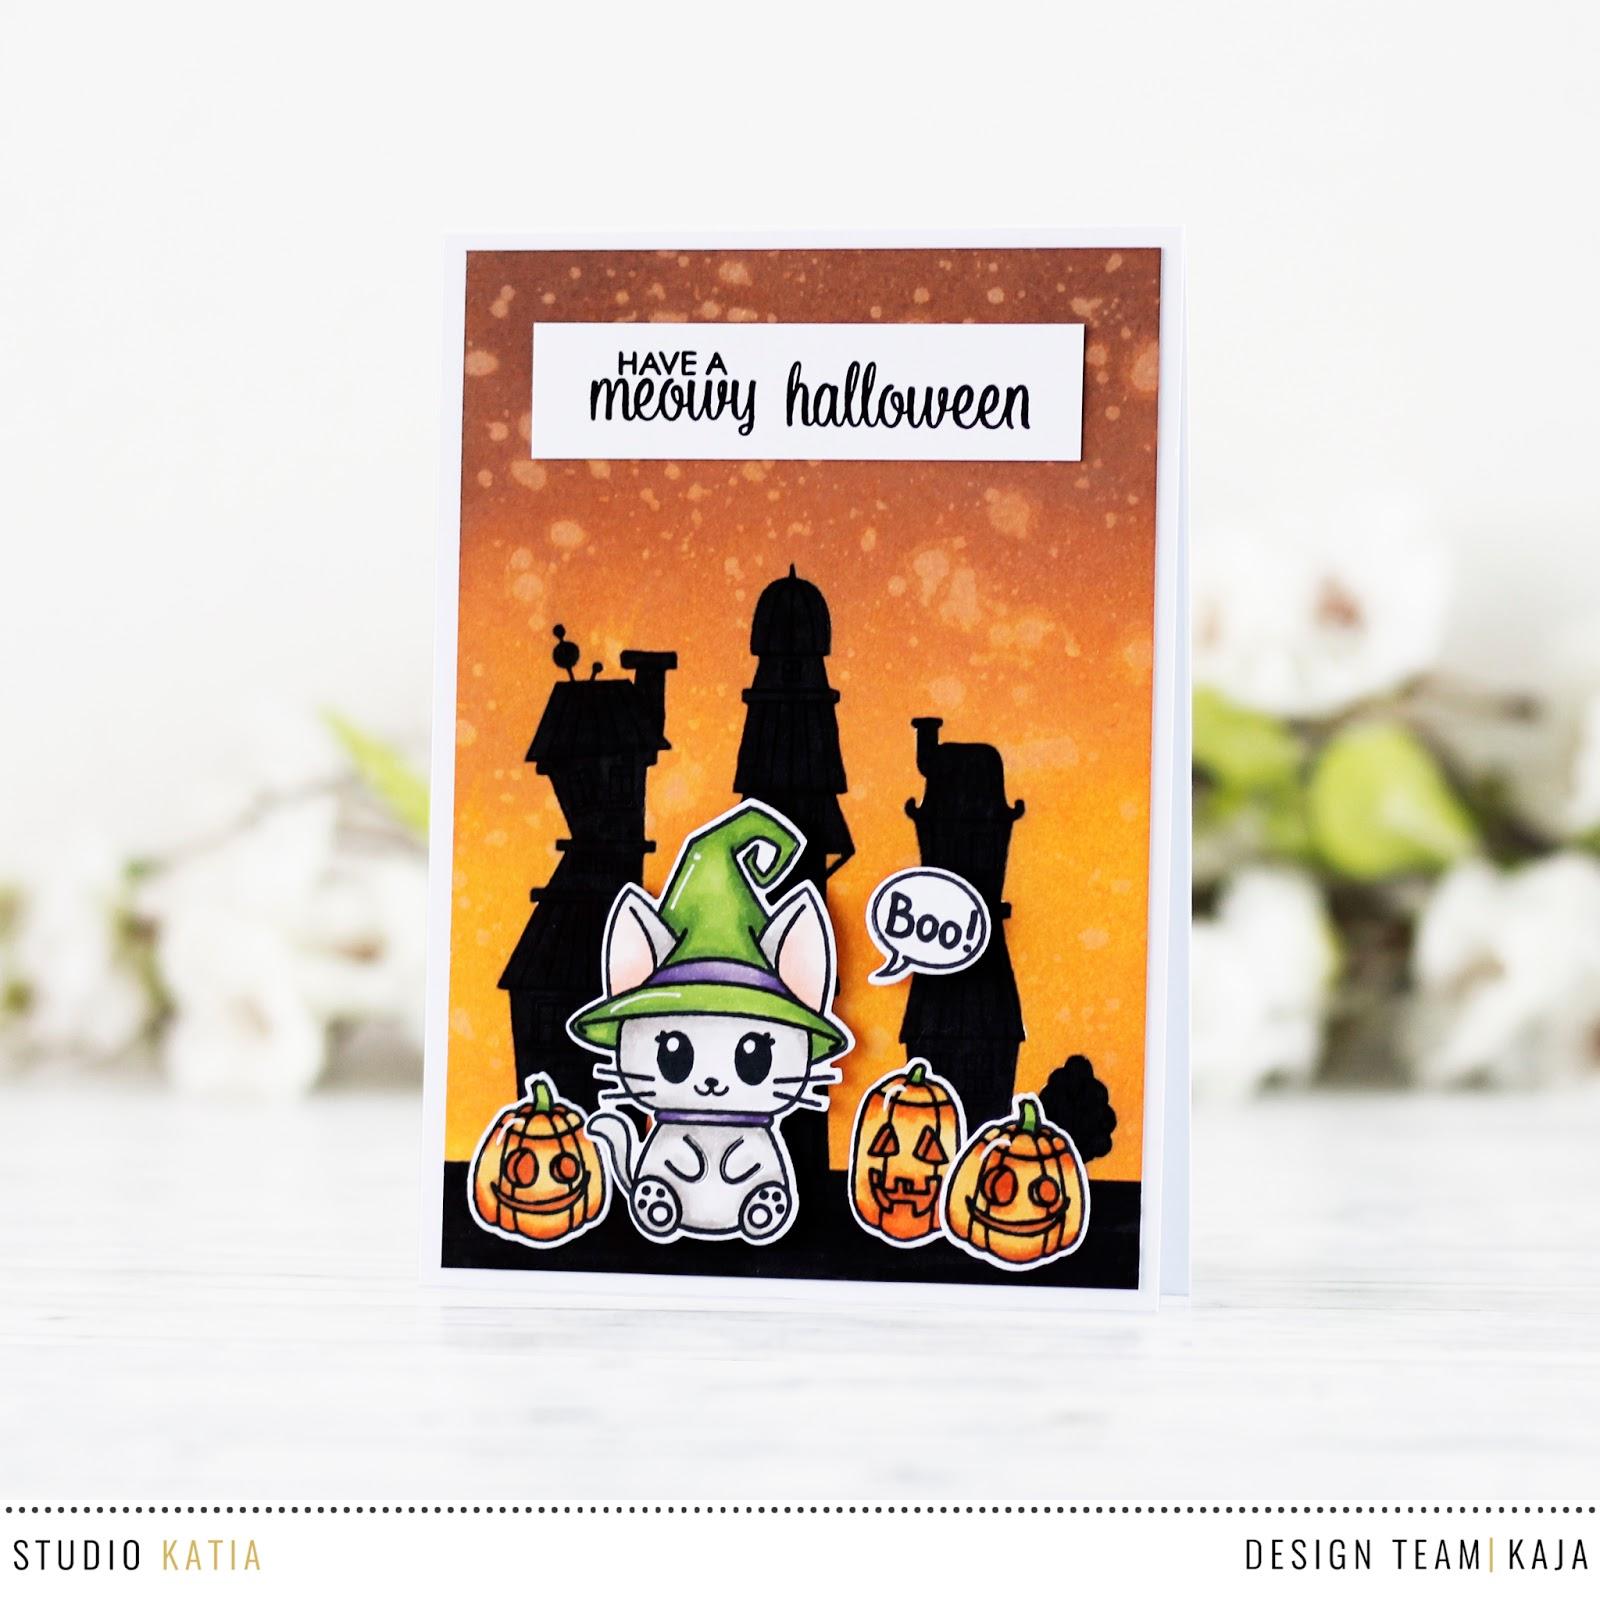 Spooky halloween | STUDIO KATIA